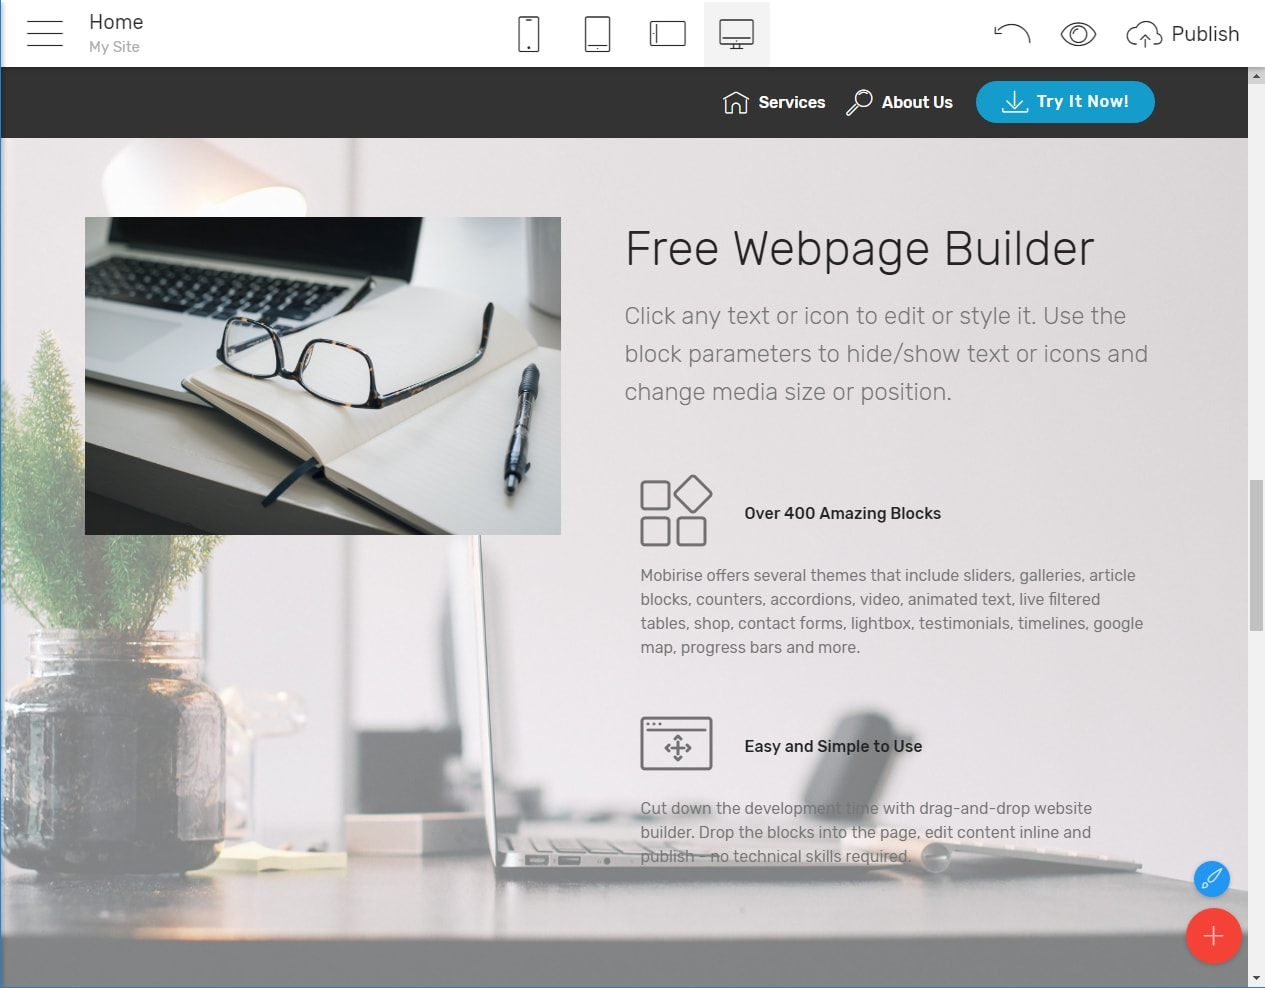 Web Page Builder